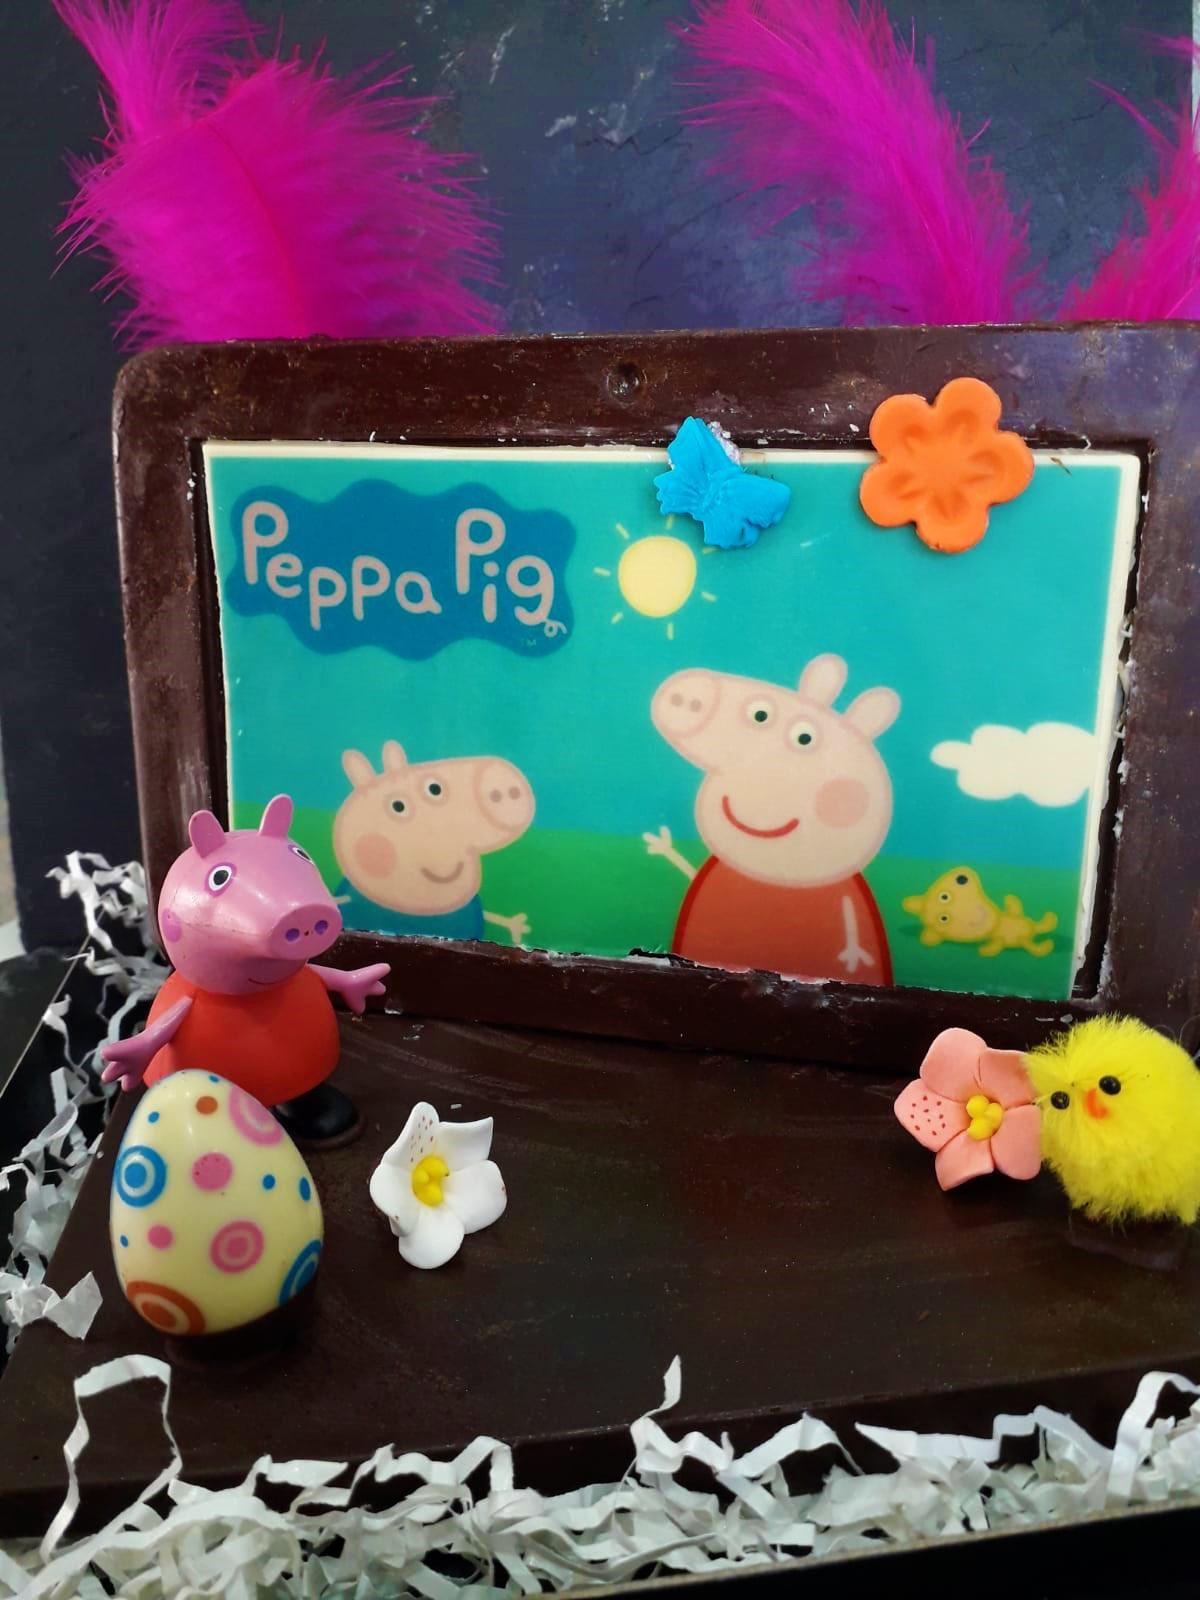 Mona Peppa Pig